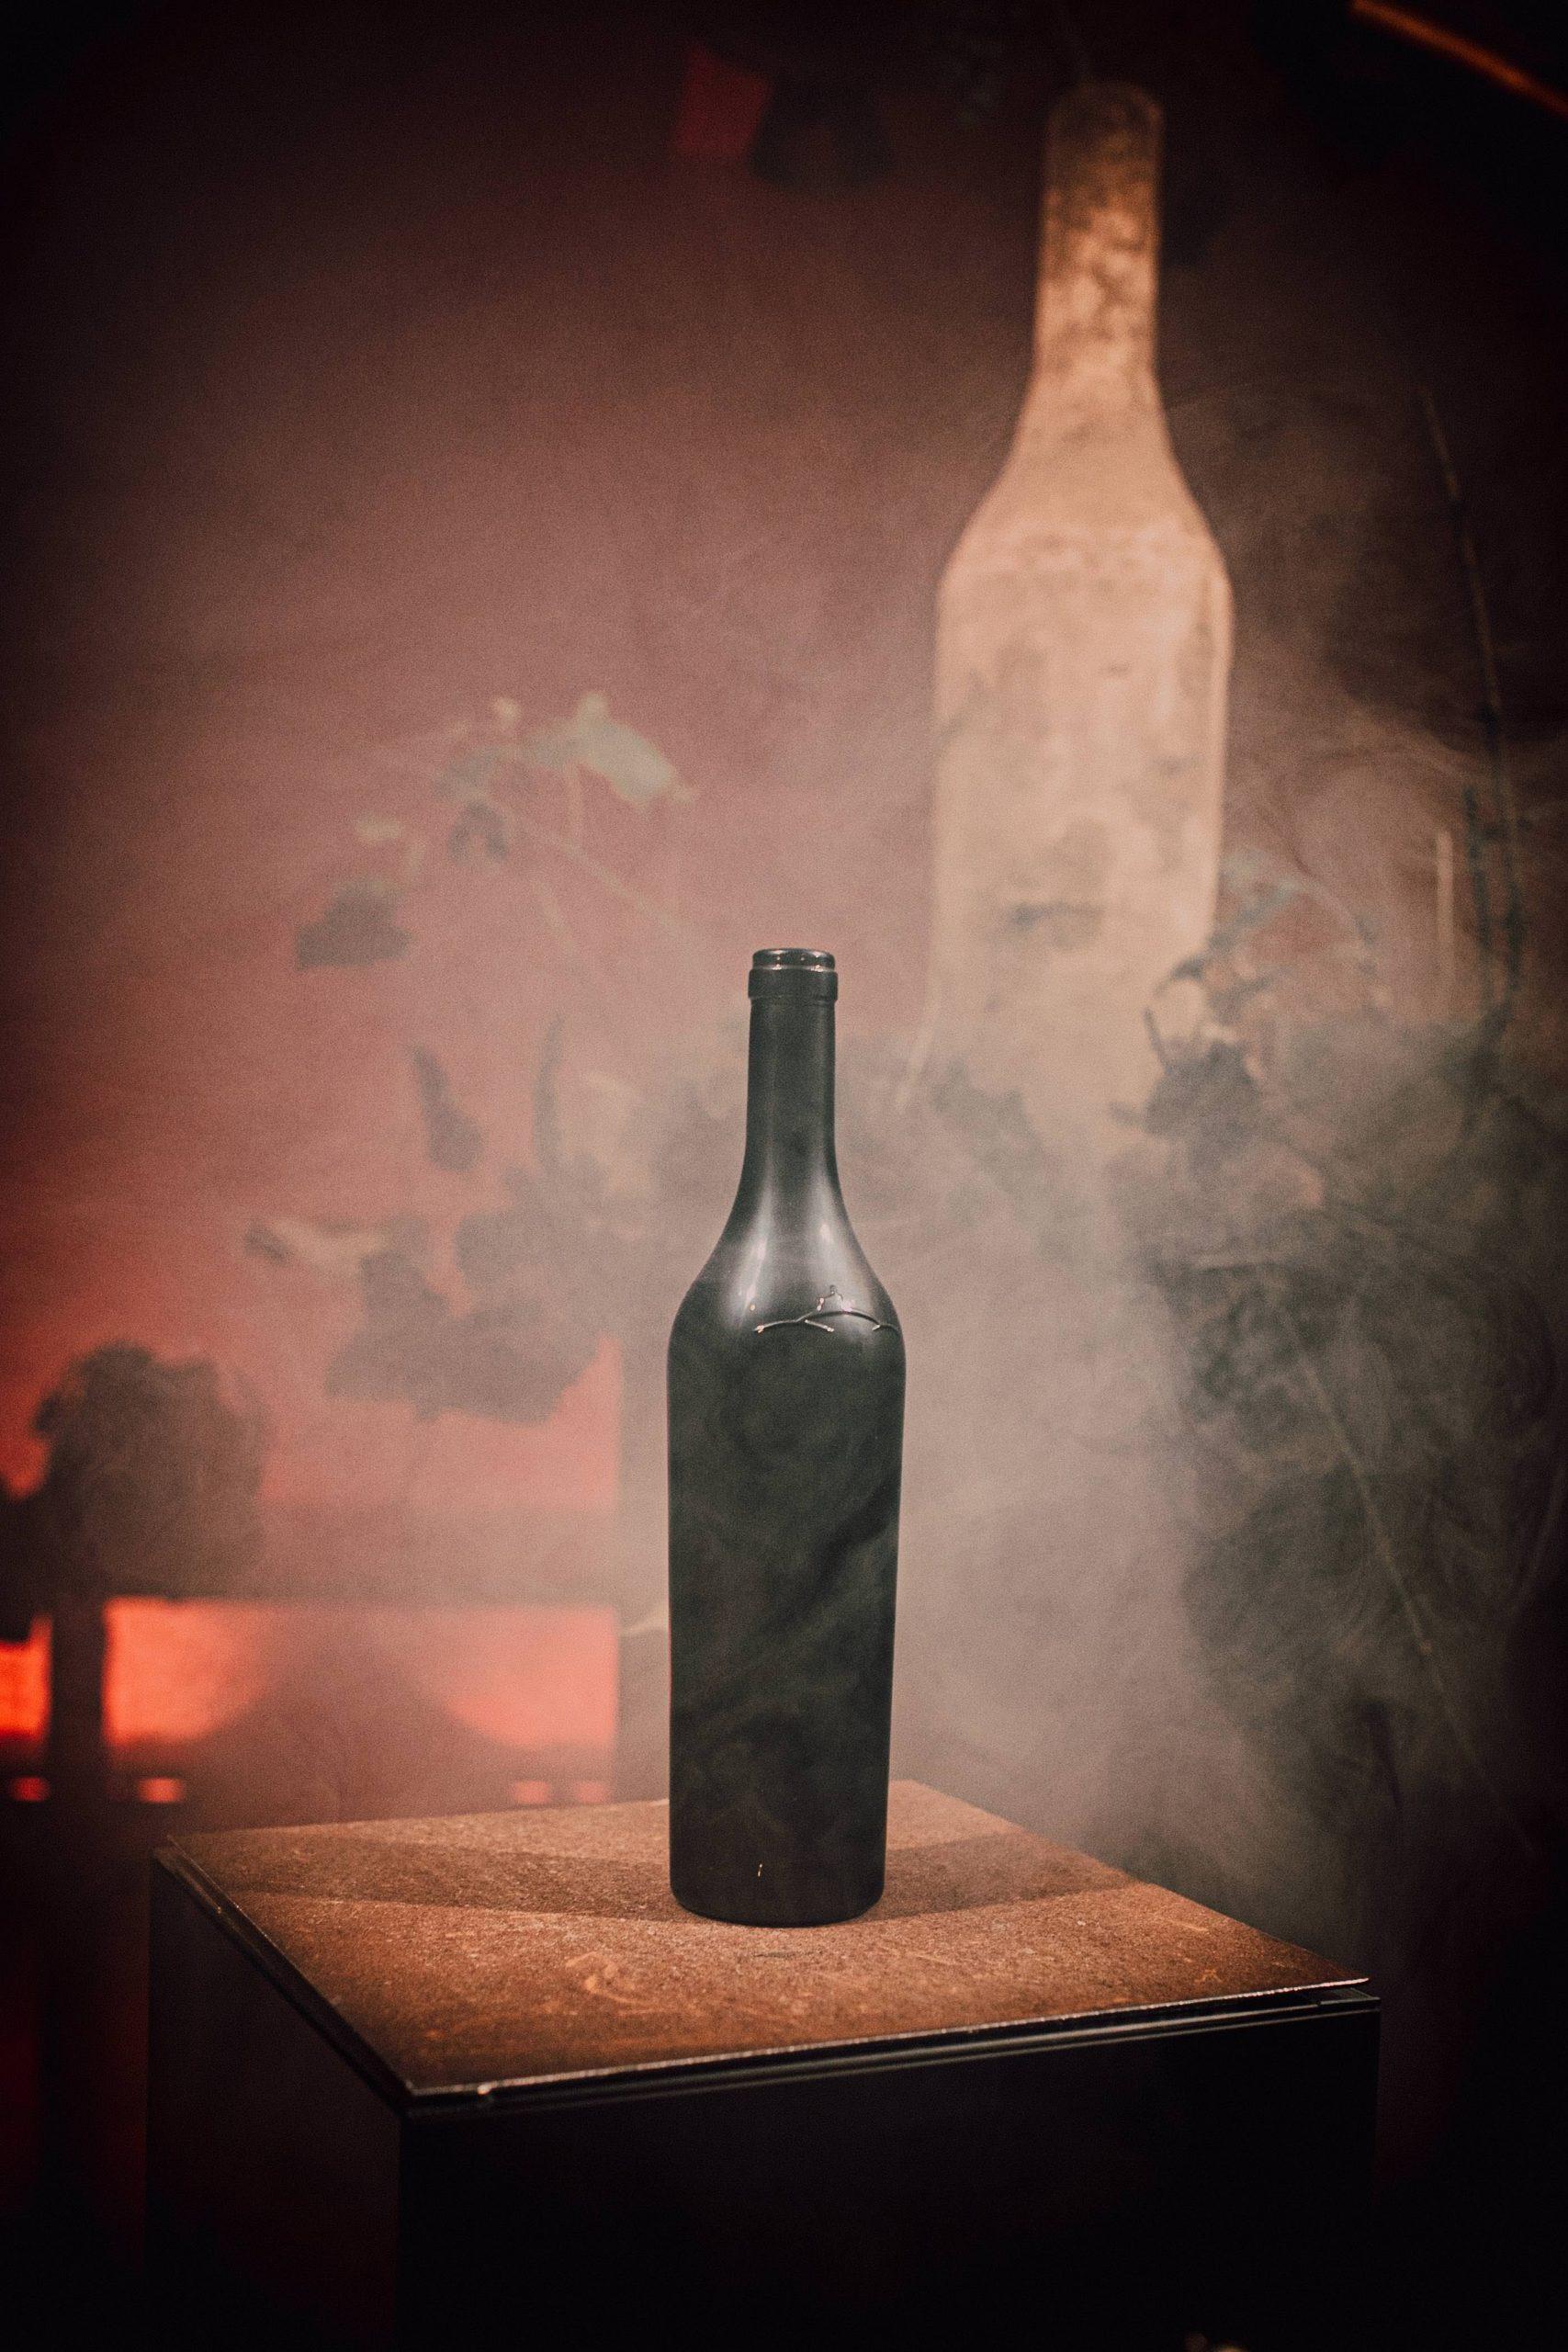 Vulkanlandflasche scaled